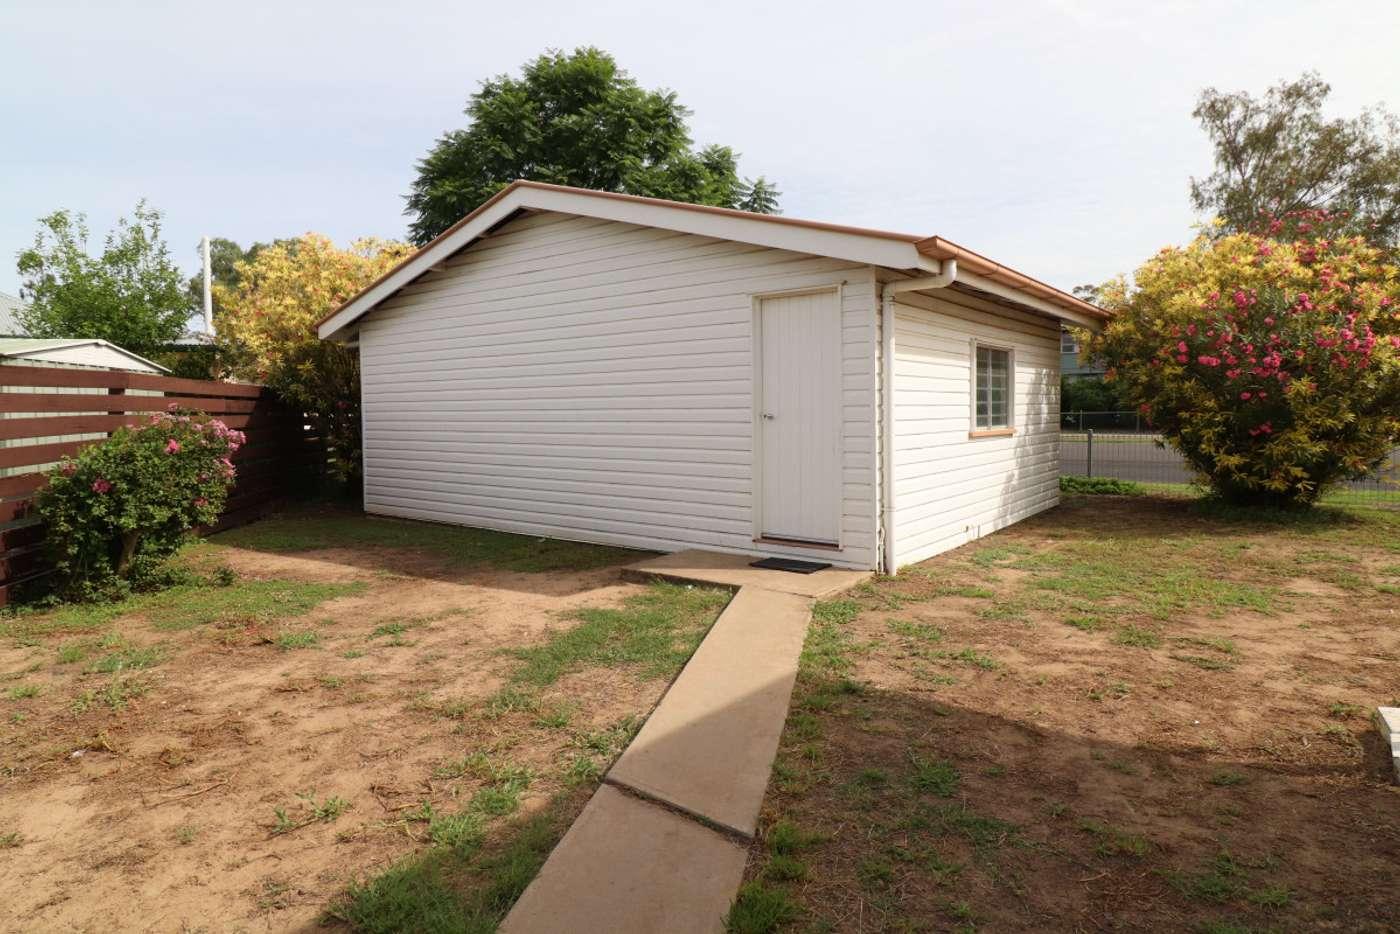 Main view of Homely house listing, 4 Sandhurst Street, Goondiwindi QLD 4390